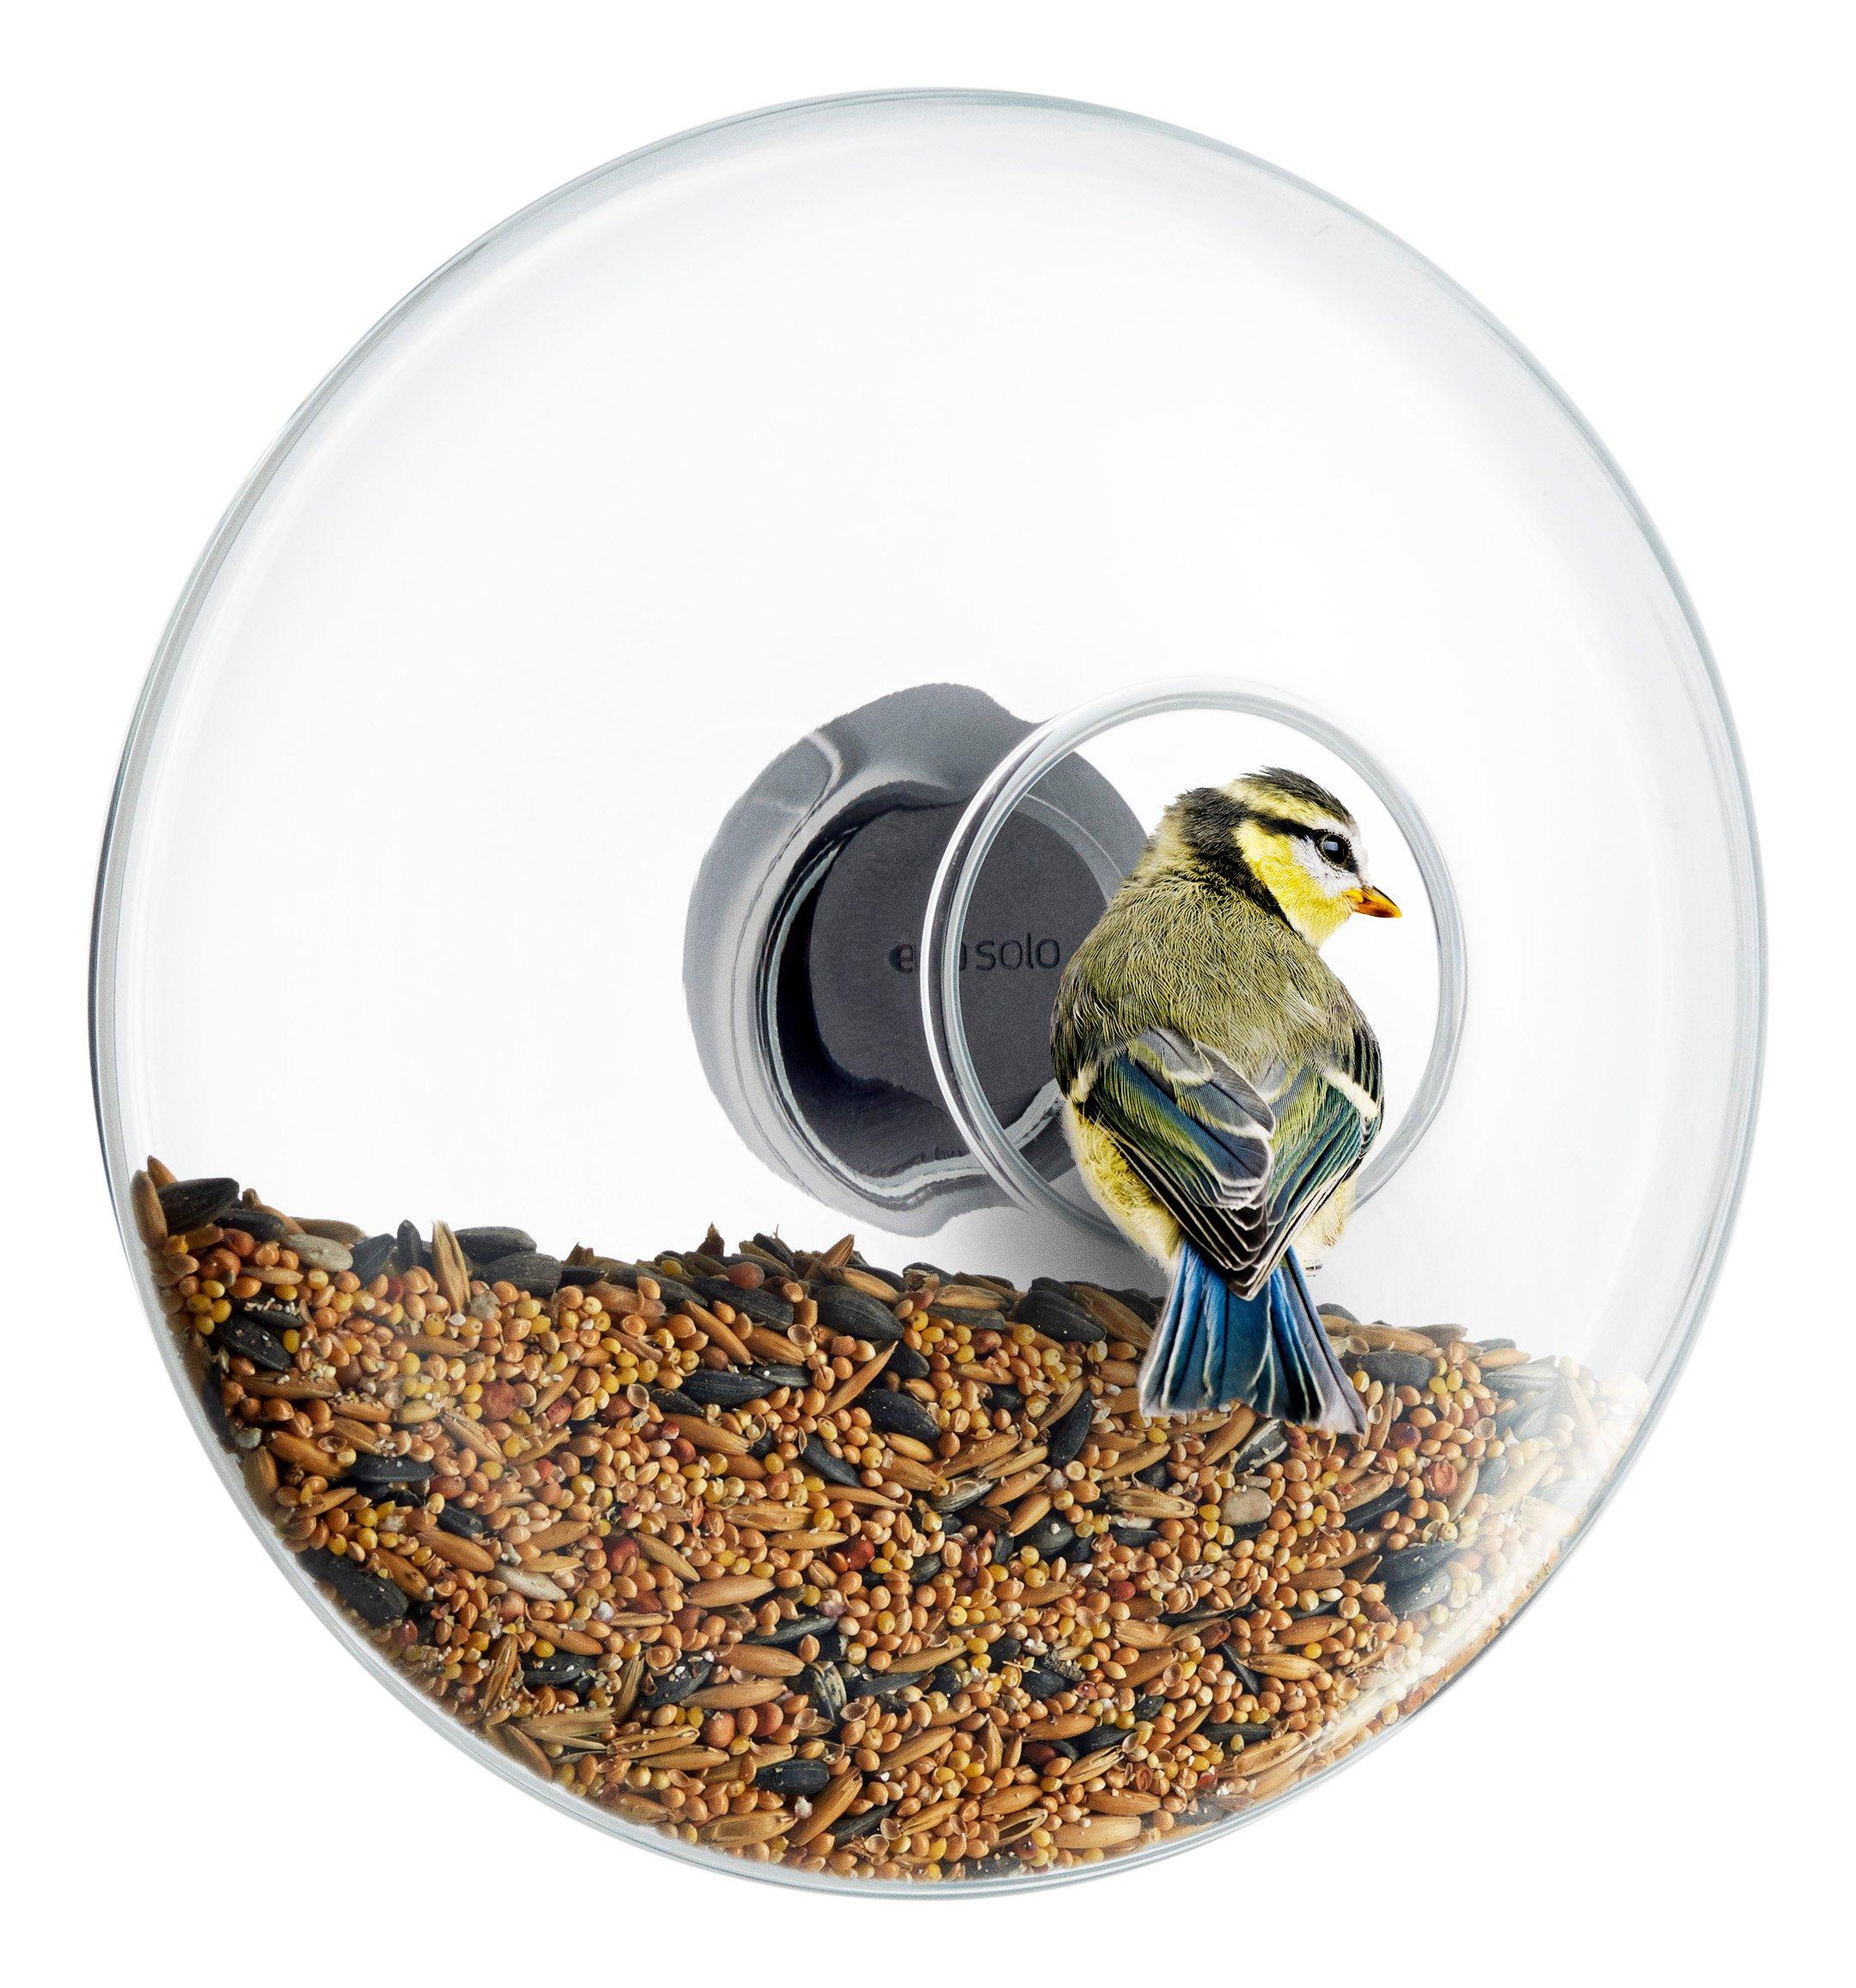 Eva Solo - Window Bird Feeder Large (571024)